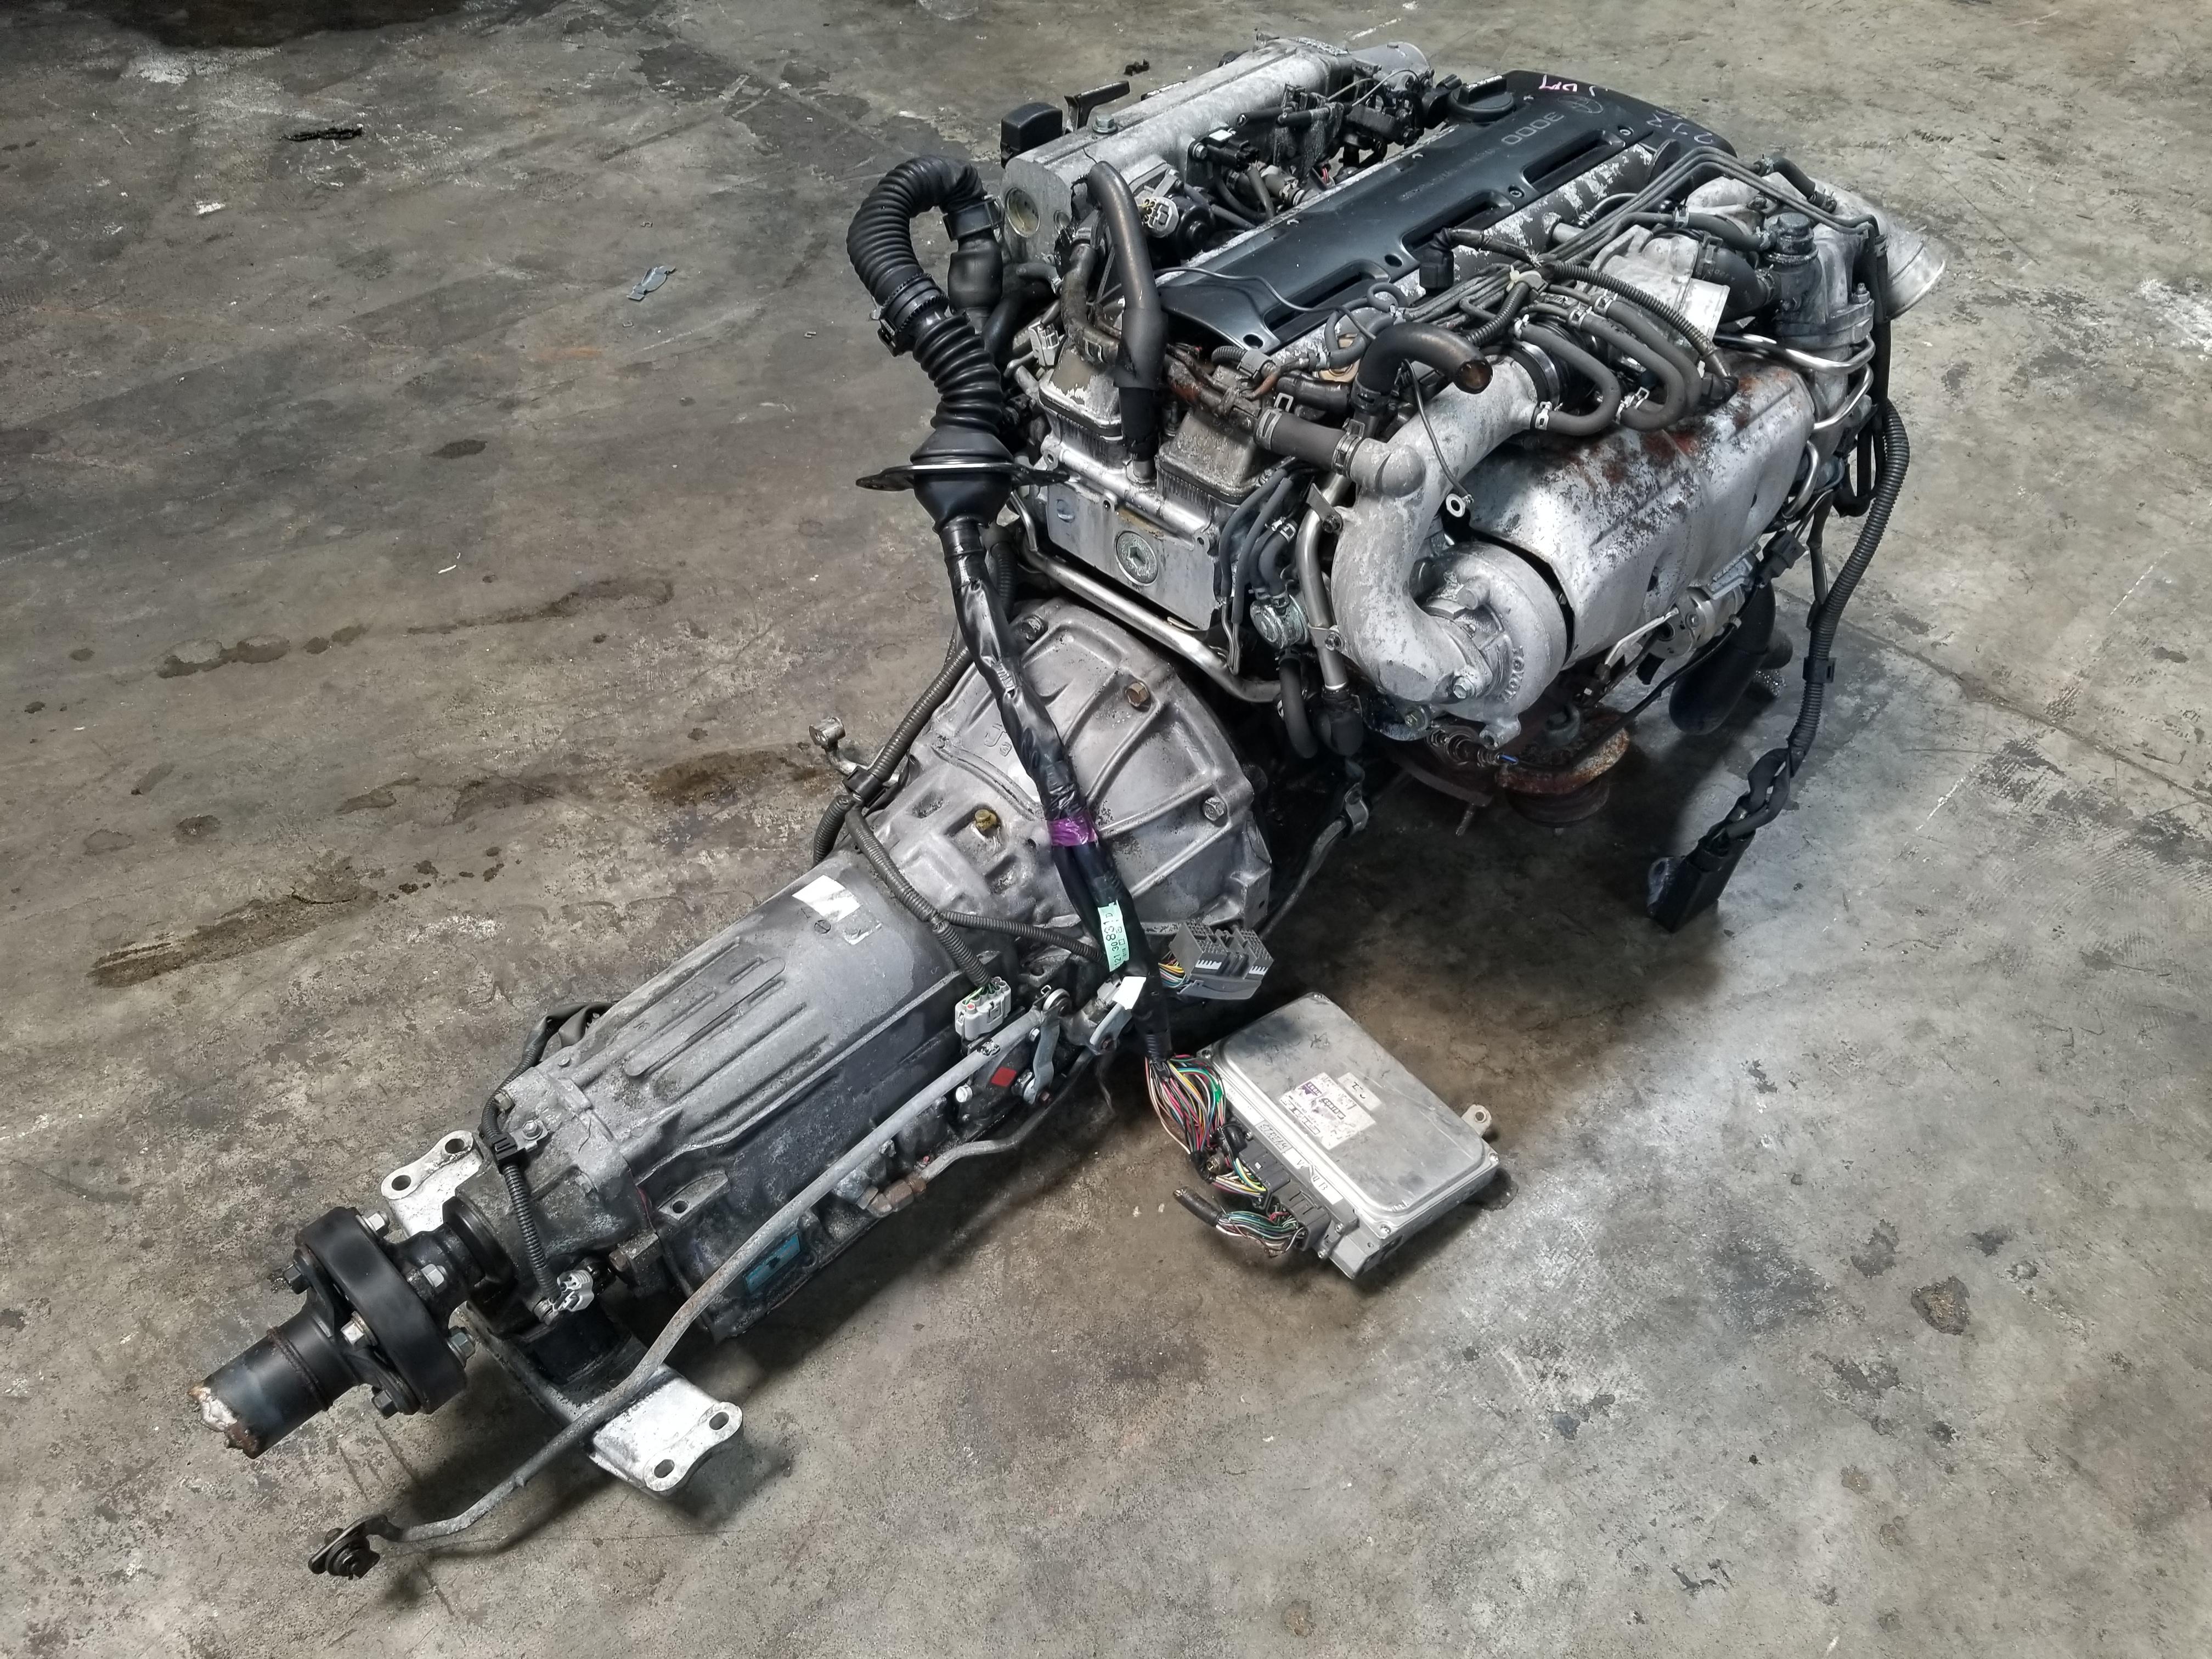 Nissan Chula Vista >> 2JZGTE Non-VVTi Twin Turbo 3.0L Toyota 2JZ Engine with Automatic Transmission Complete Swap ...